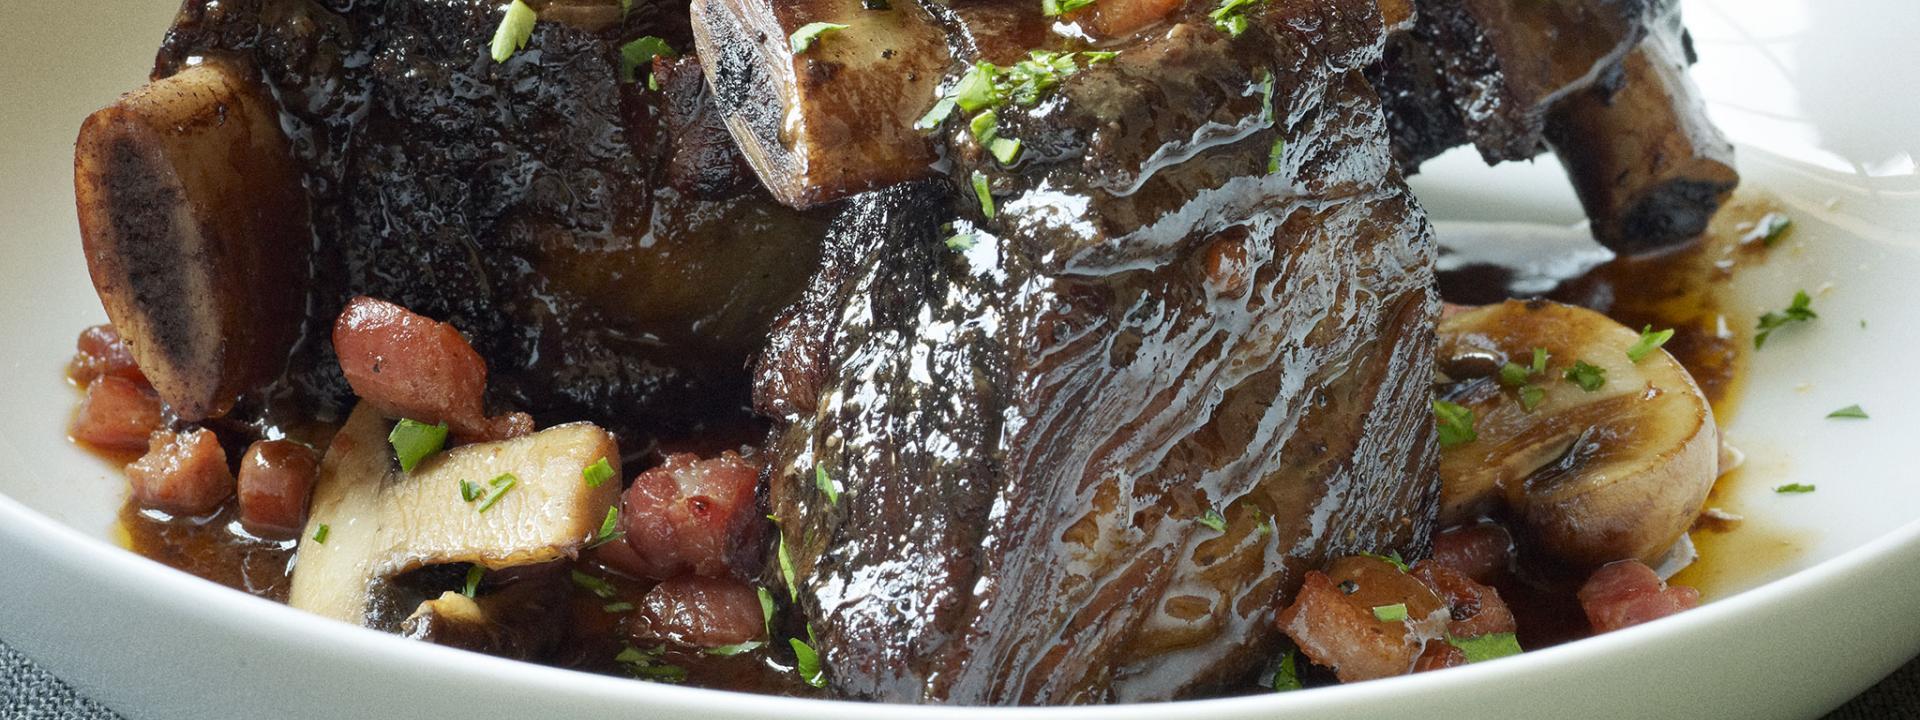 slow cooked beef short ribs recipe gordon ramsay recipes